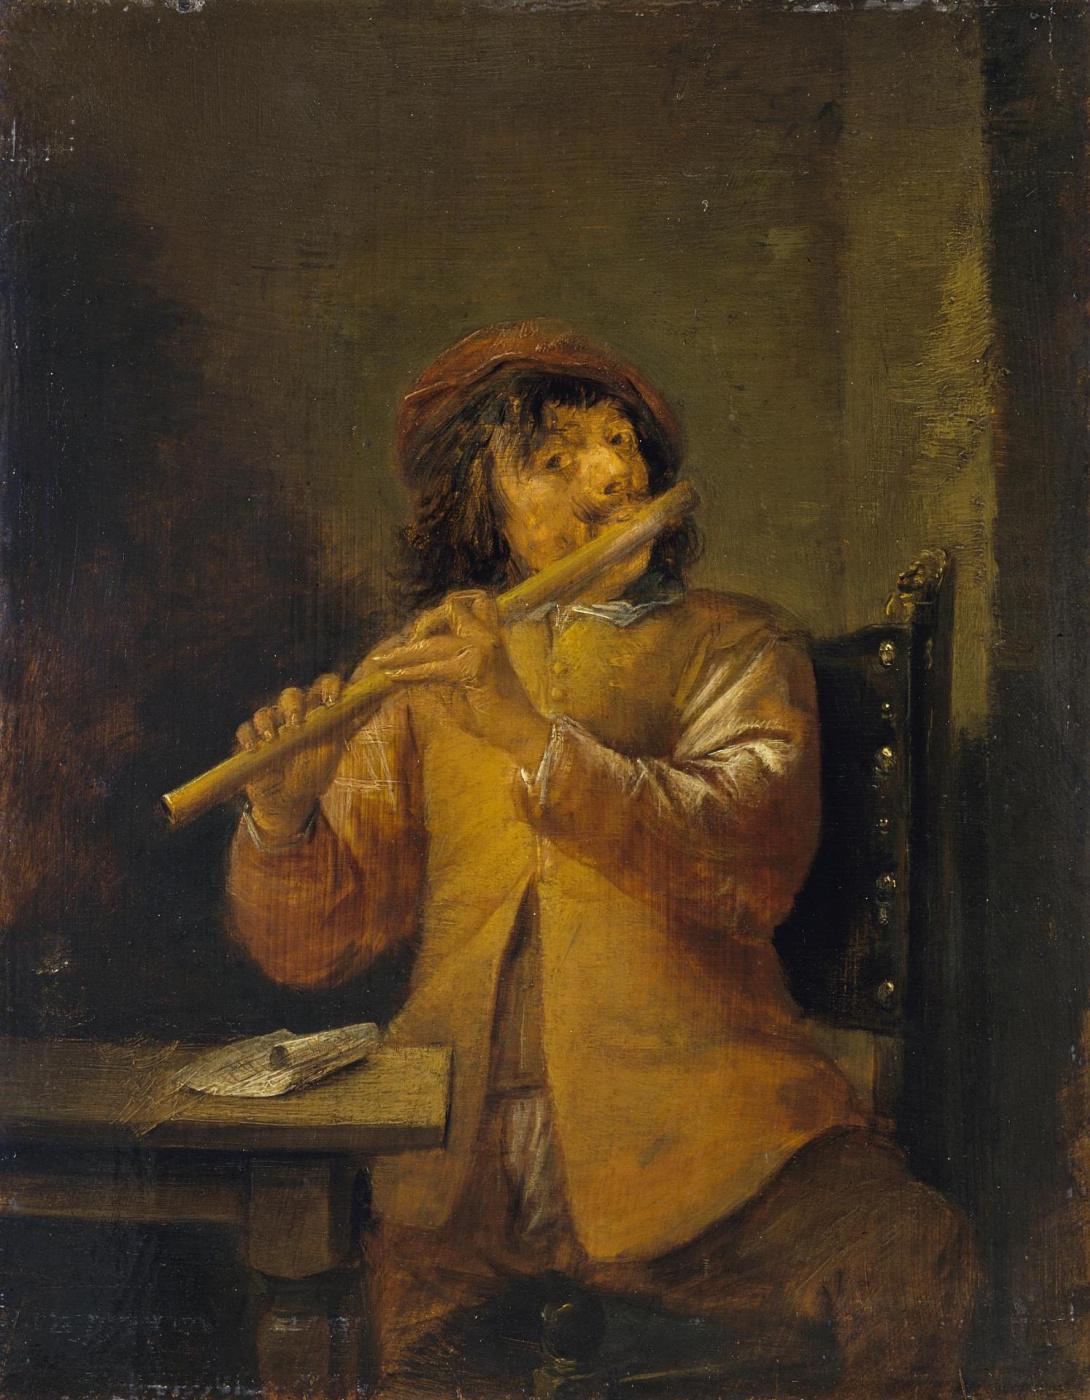 David Teniers the Younger. Flutist